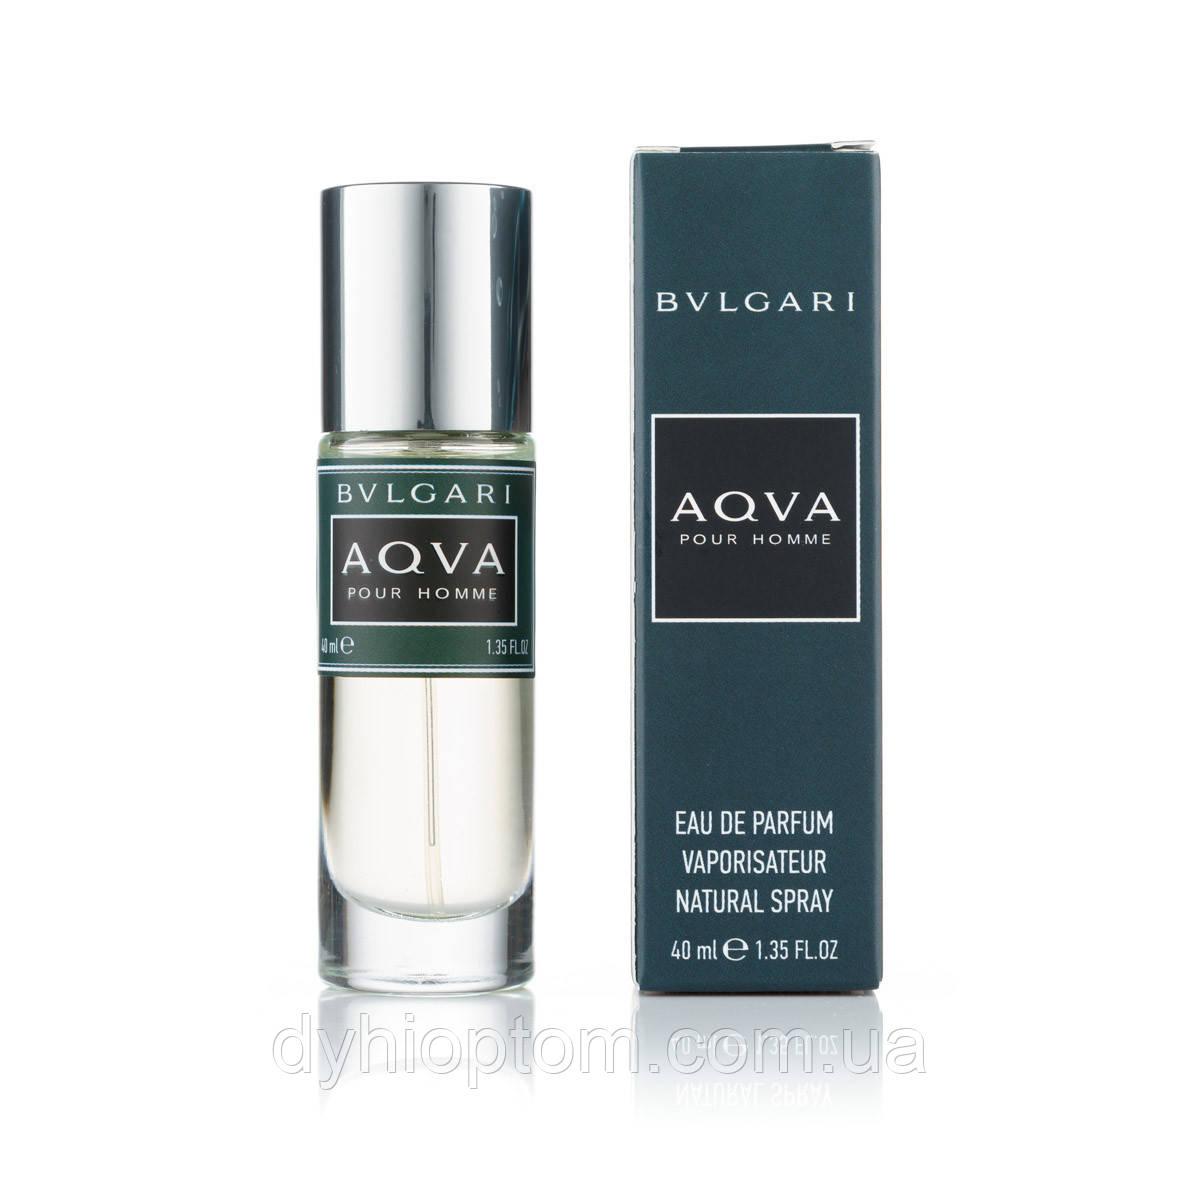 Мини парфюм мужской 40ml Bvlgari Aqva Pour Homme